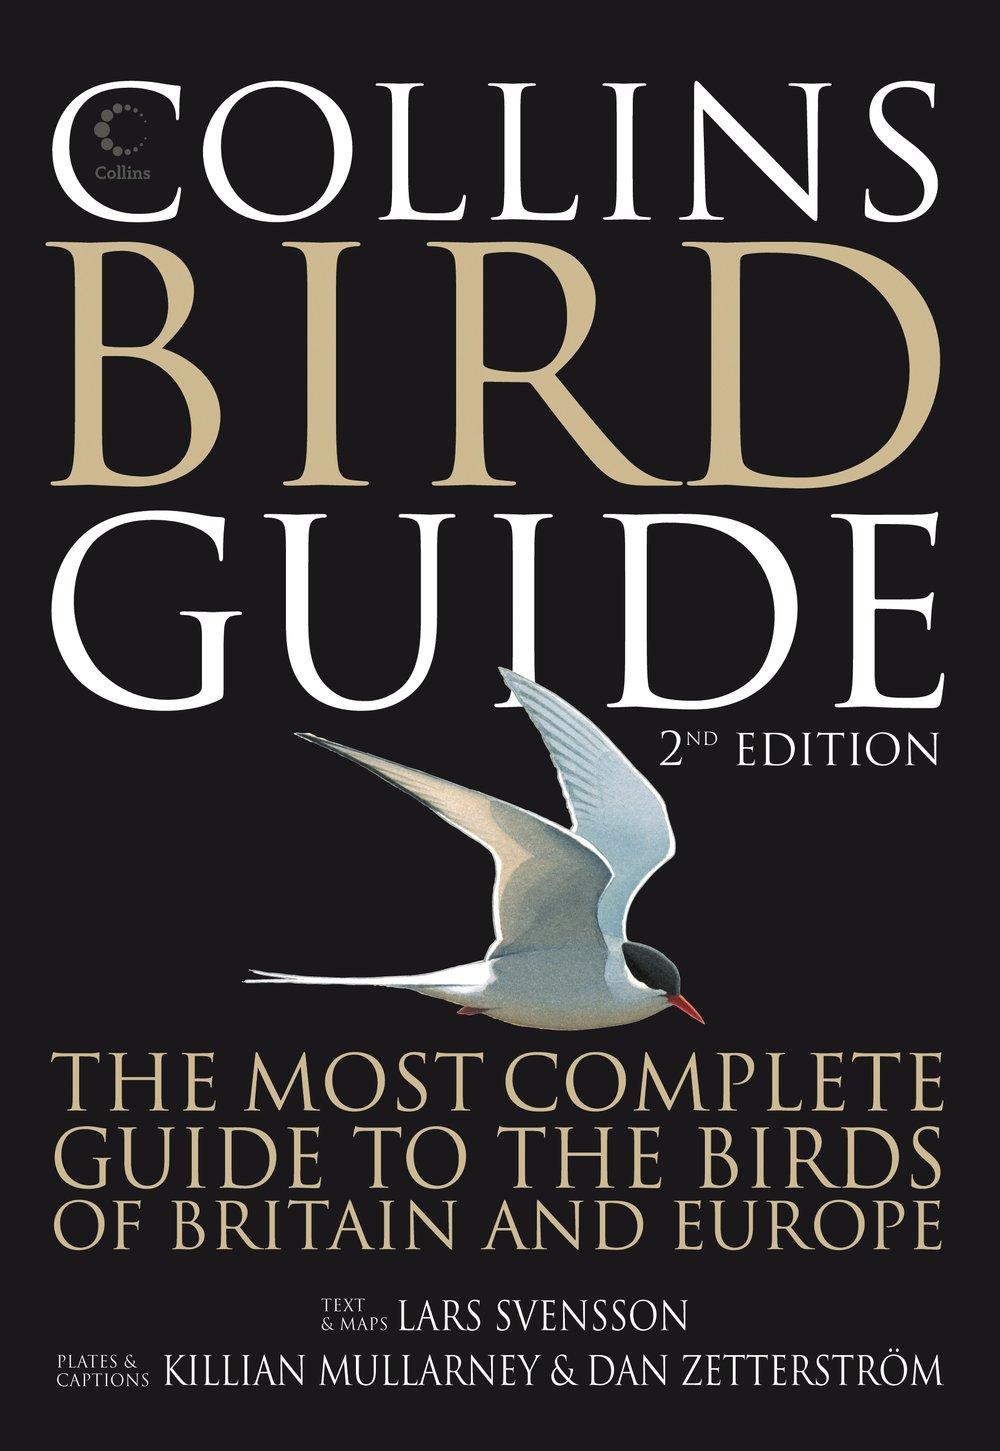 Collins Bird Guide.jpg